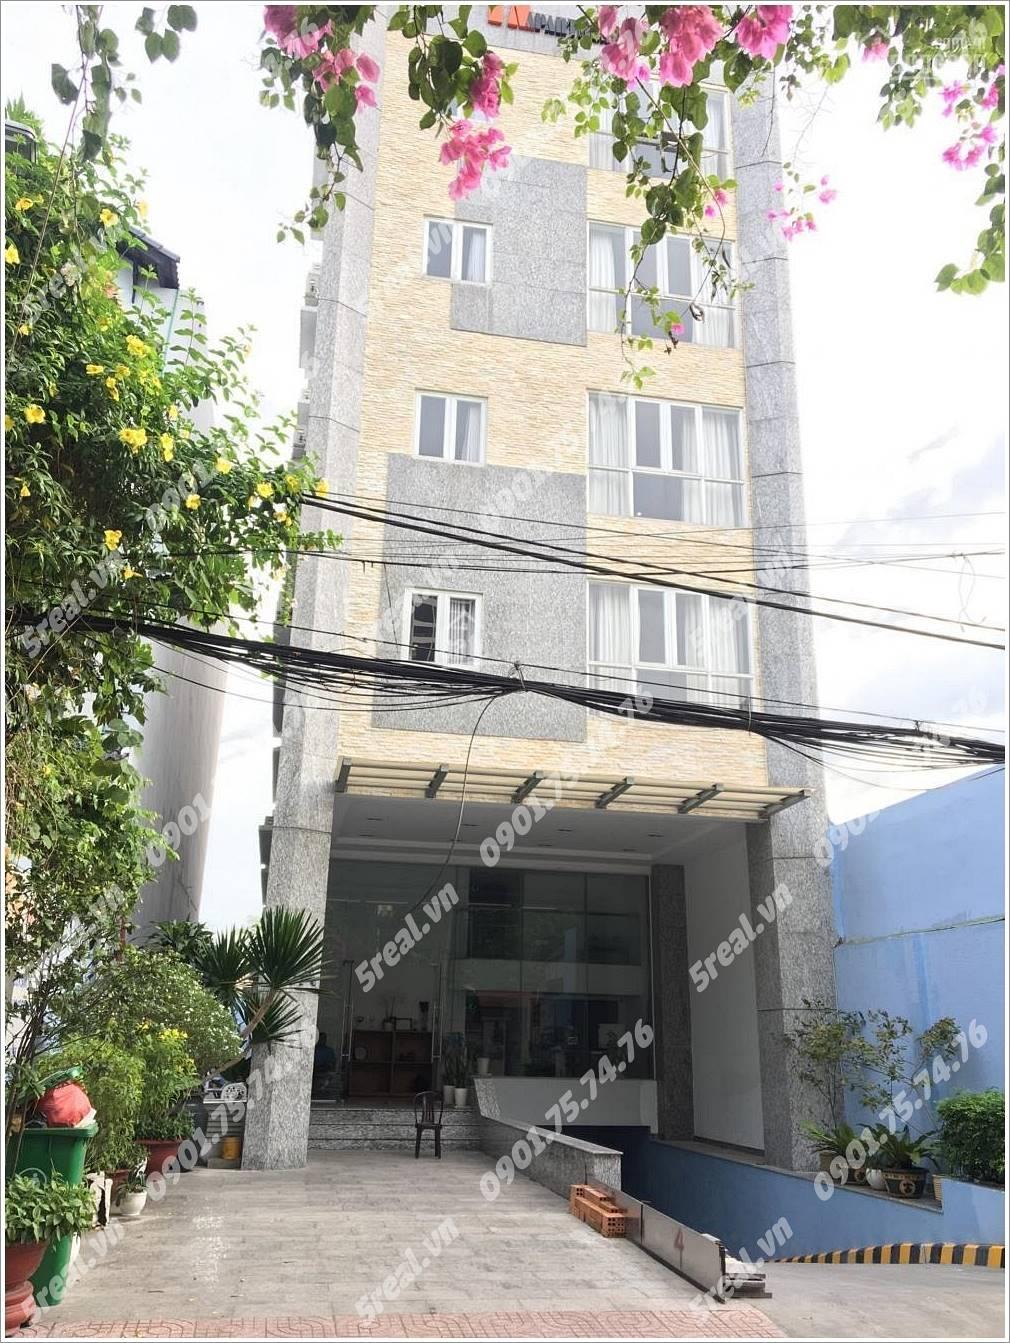 tong-huu-dinh-building-quan-2-van-phong-cho-thue-5real.vn-01